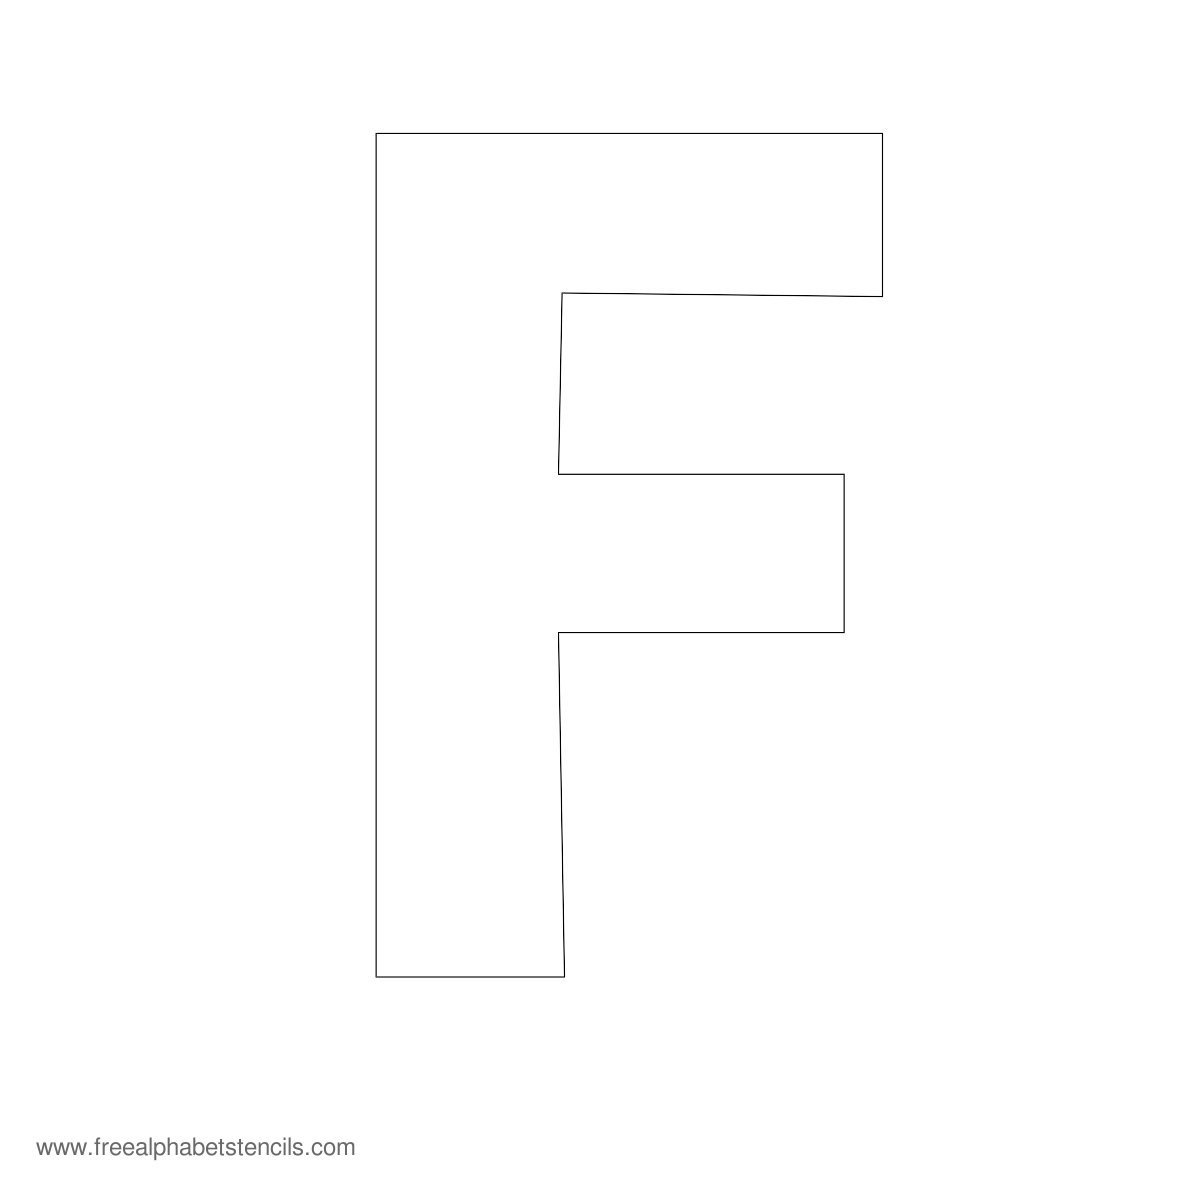 Large Alphabet Stencils | Freealphabetstencils - Free Printable Extra Large Letter Stencils